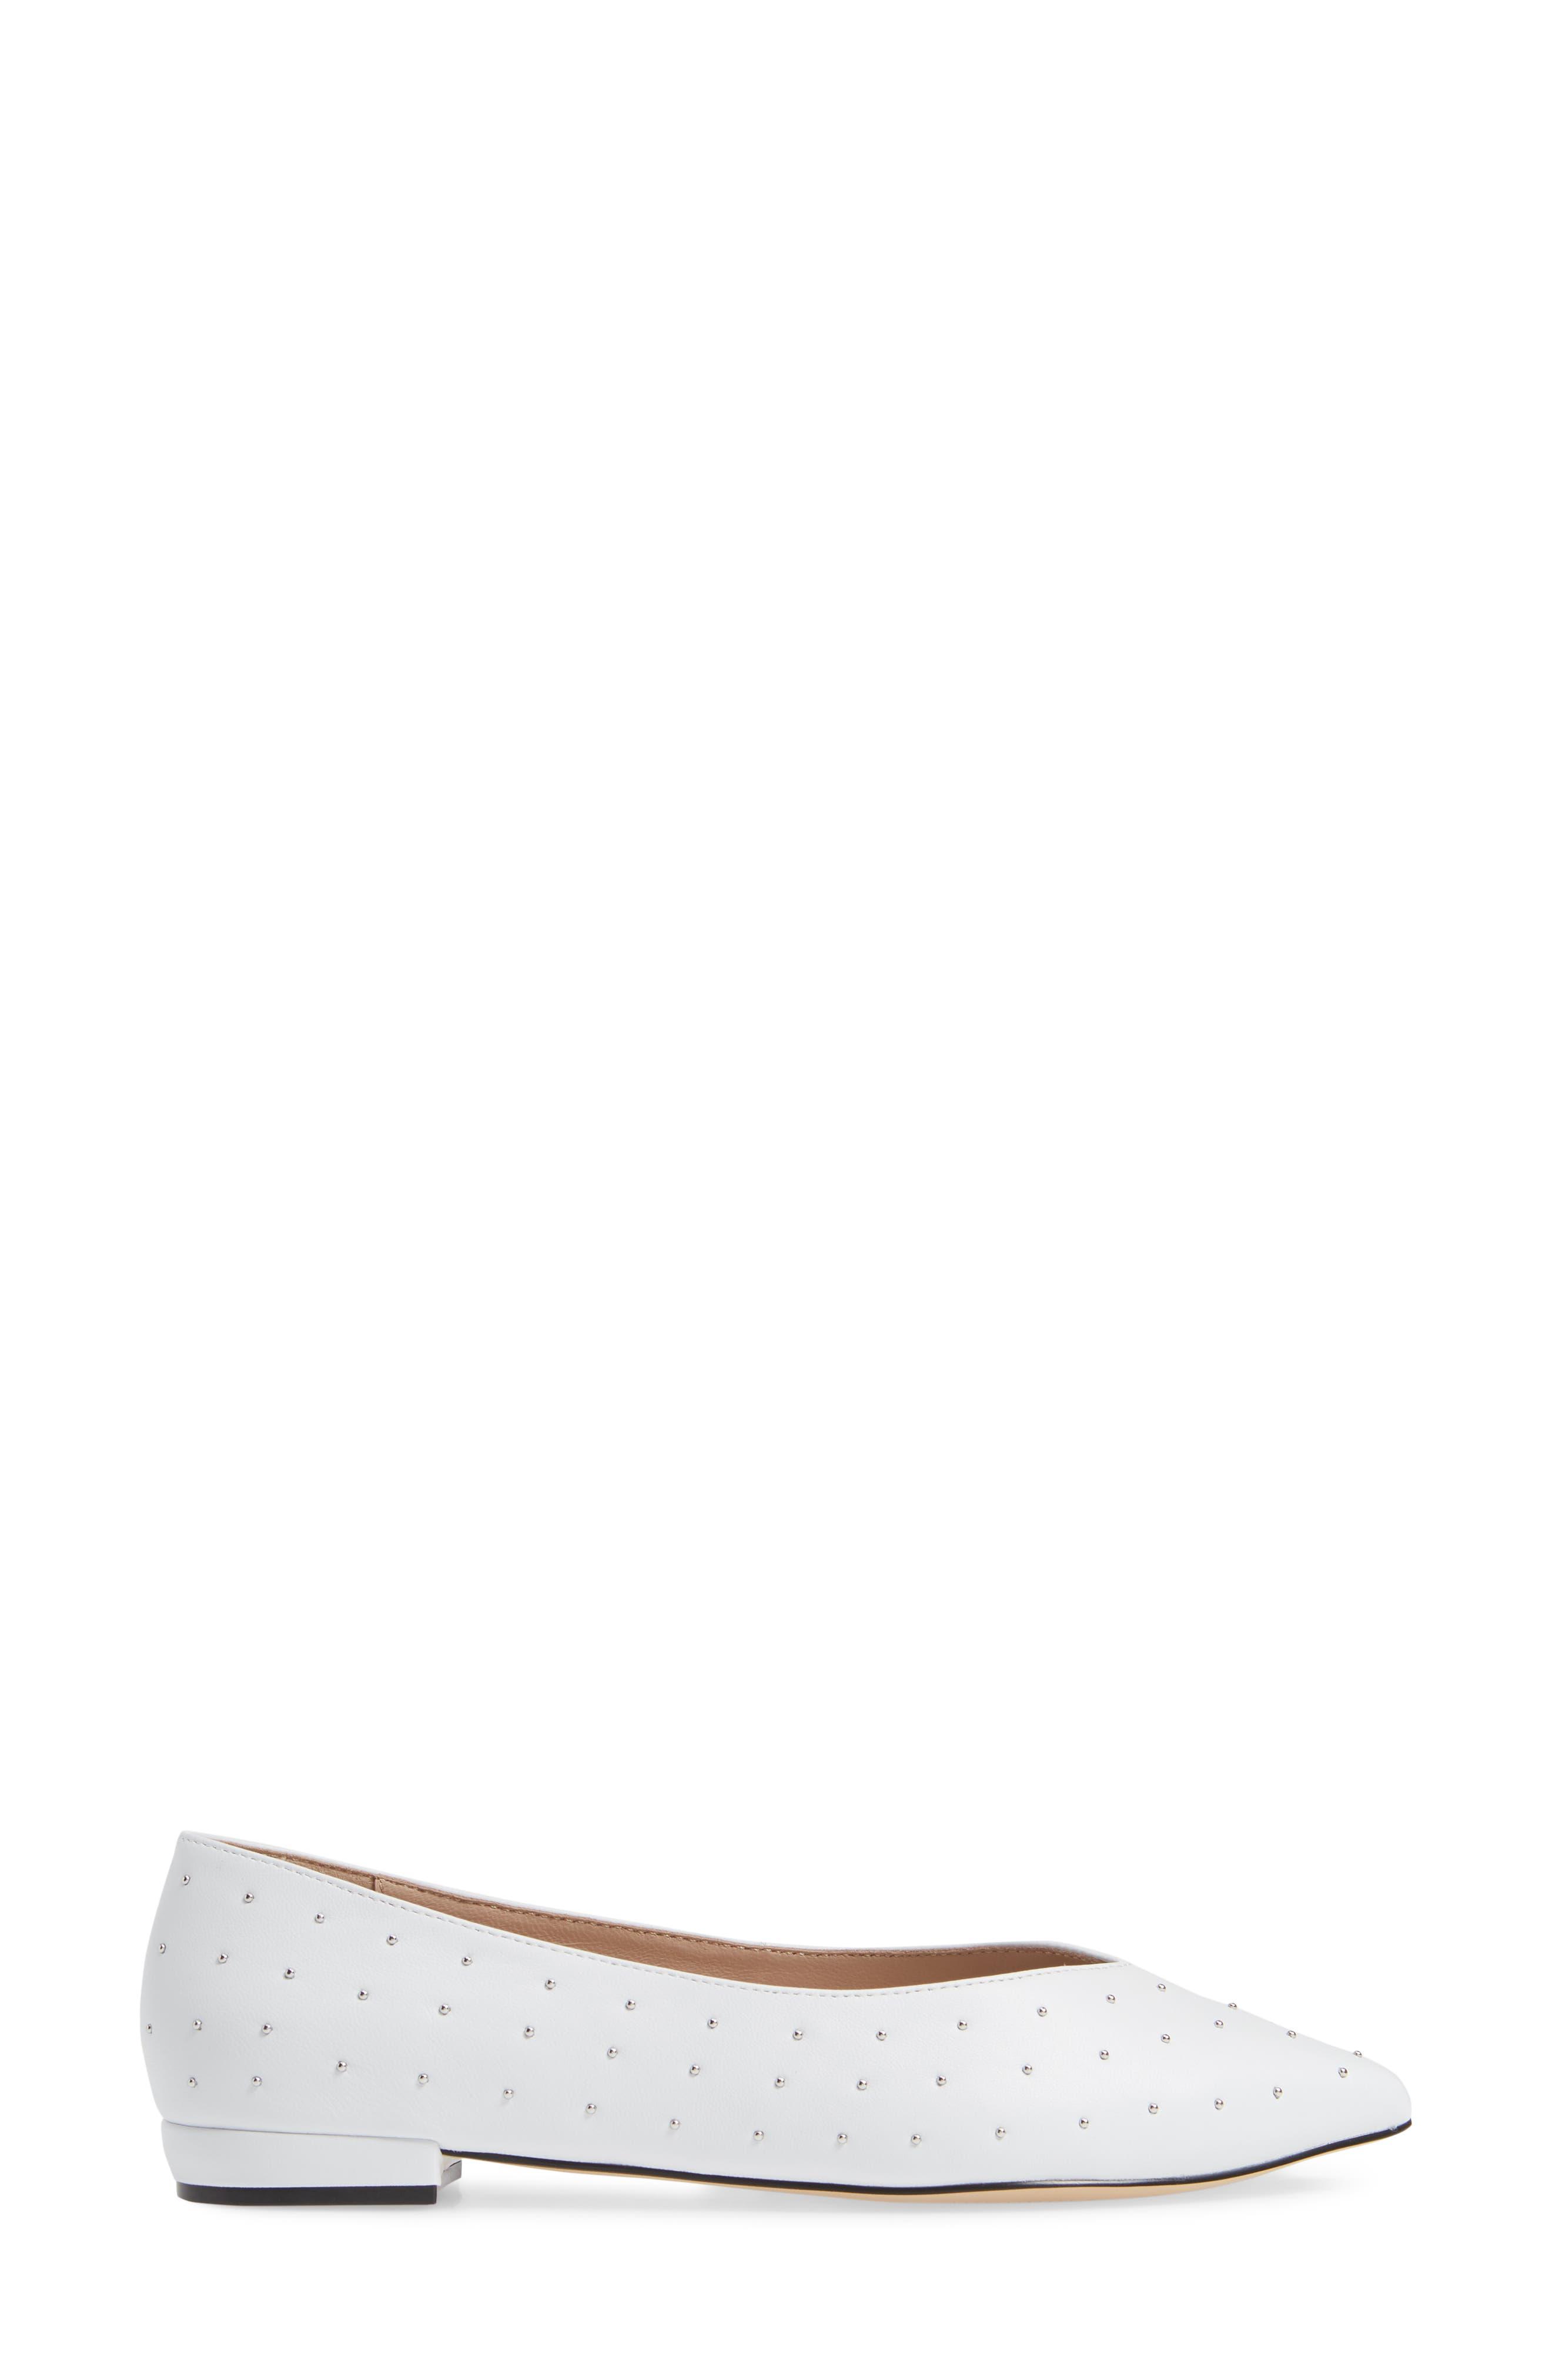 Snbea Studded Flat,                             Alternate thumbnail 4, color,                             WHITE LEATHER